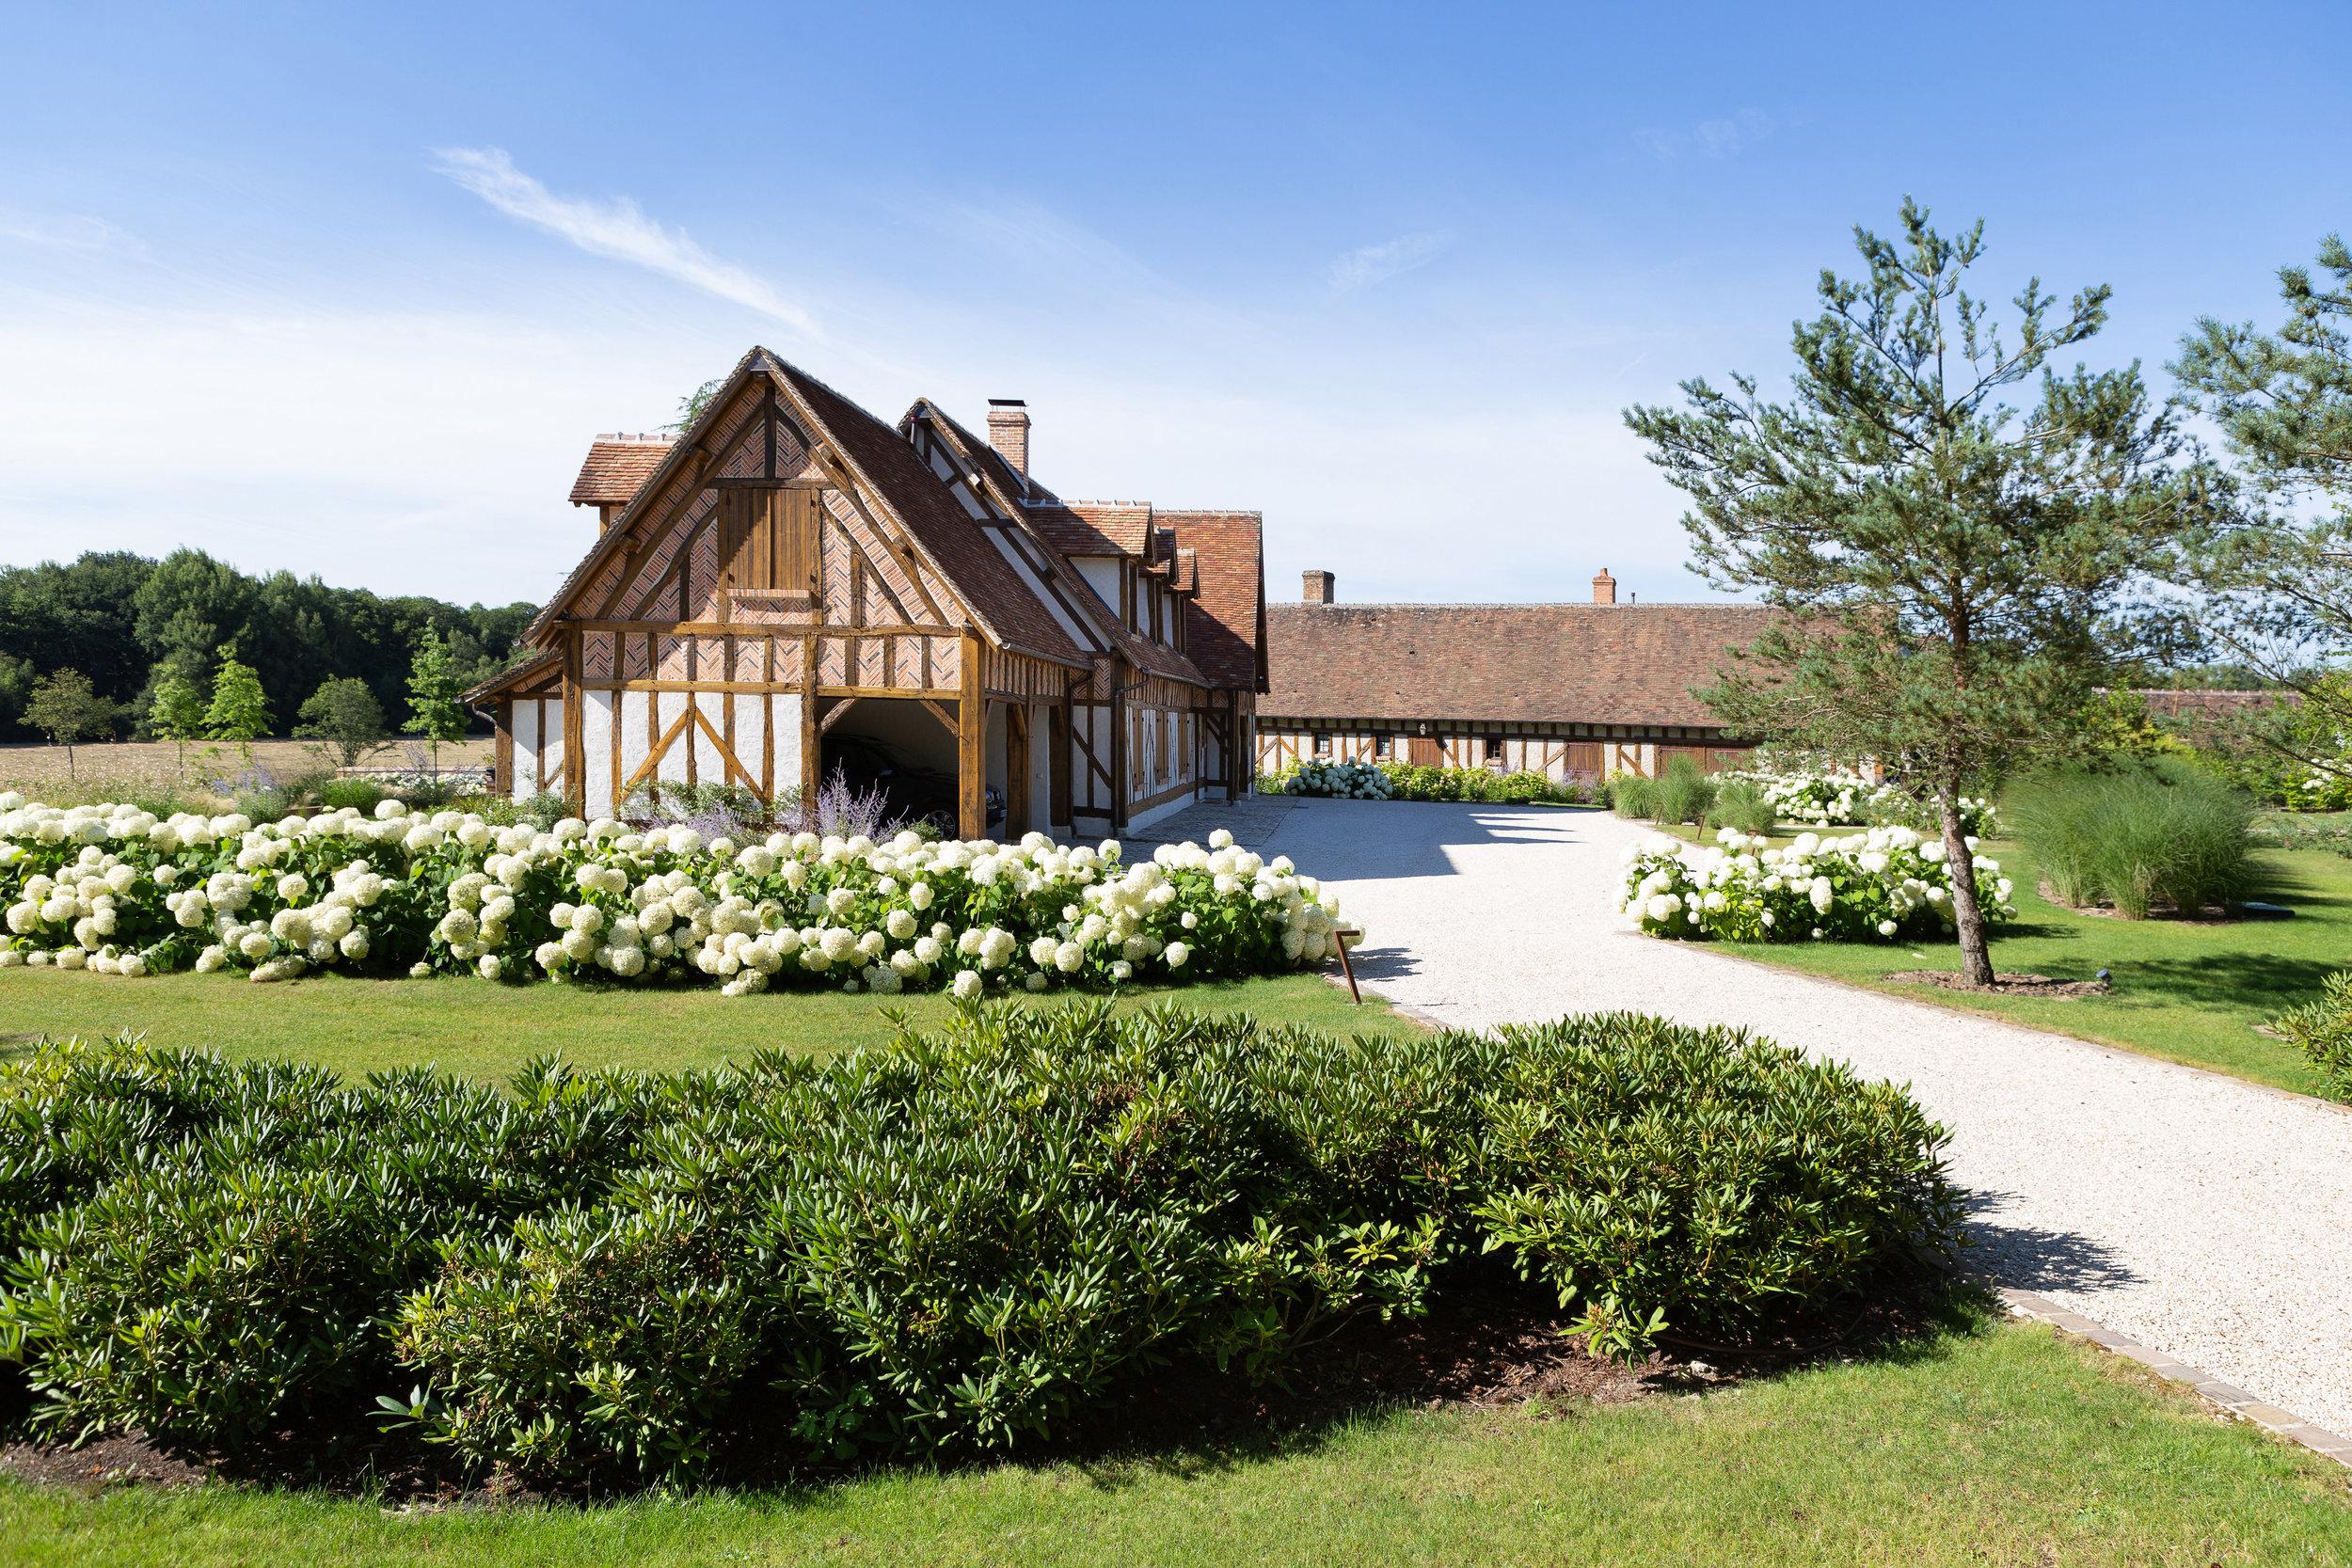 jardin_privé_vouzon_sologne_terrasses_jardins_outdoor_design_christophe_gautrand_paysagiste_3.jpg